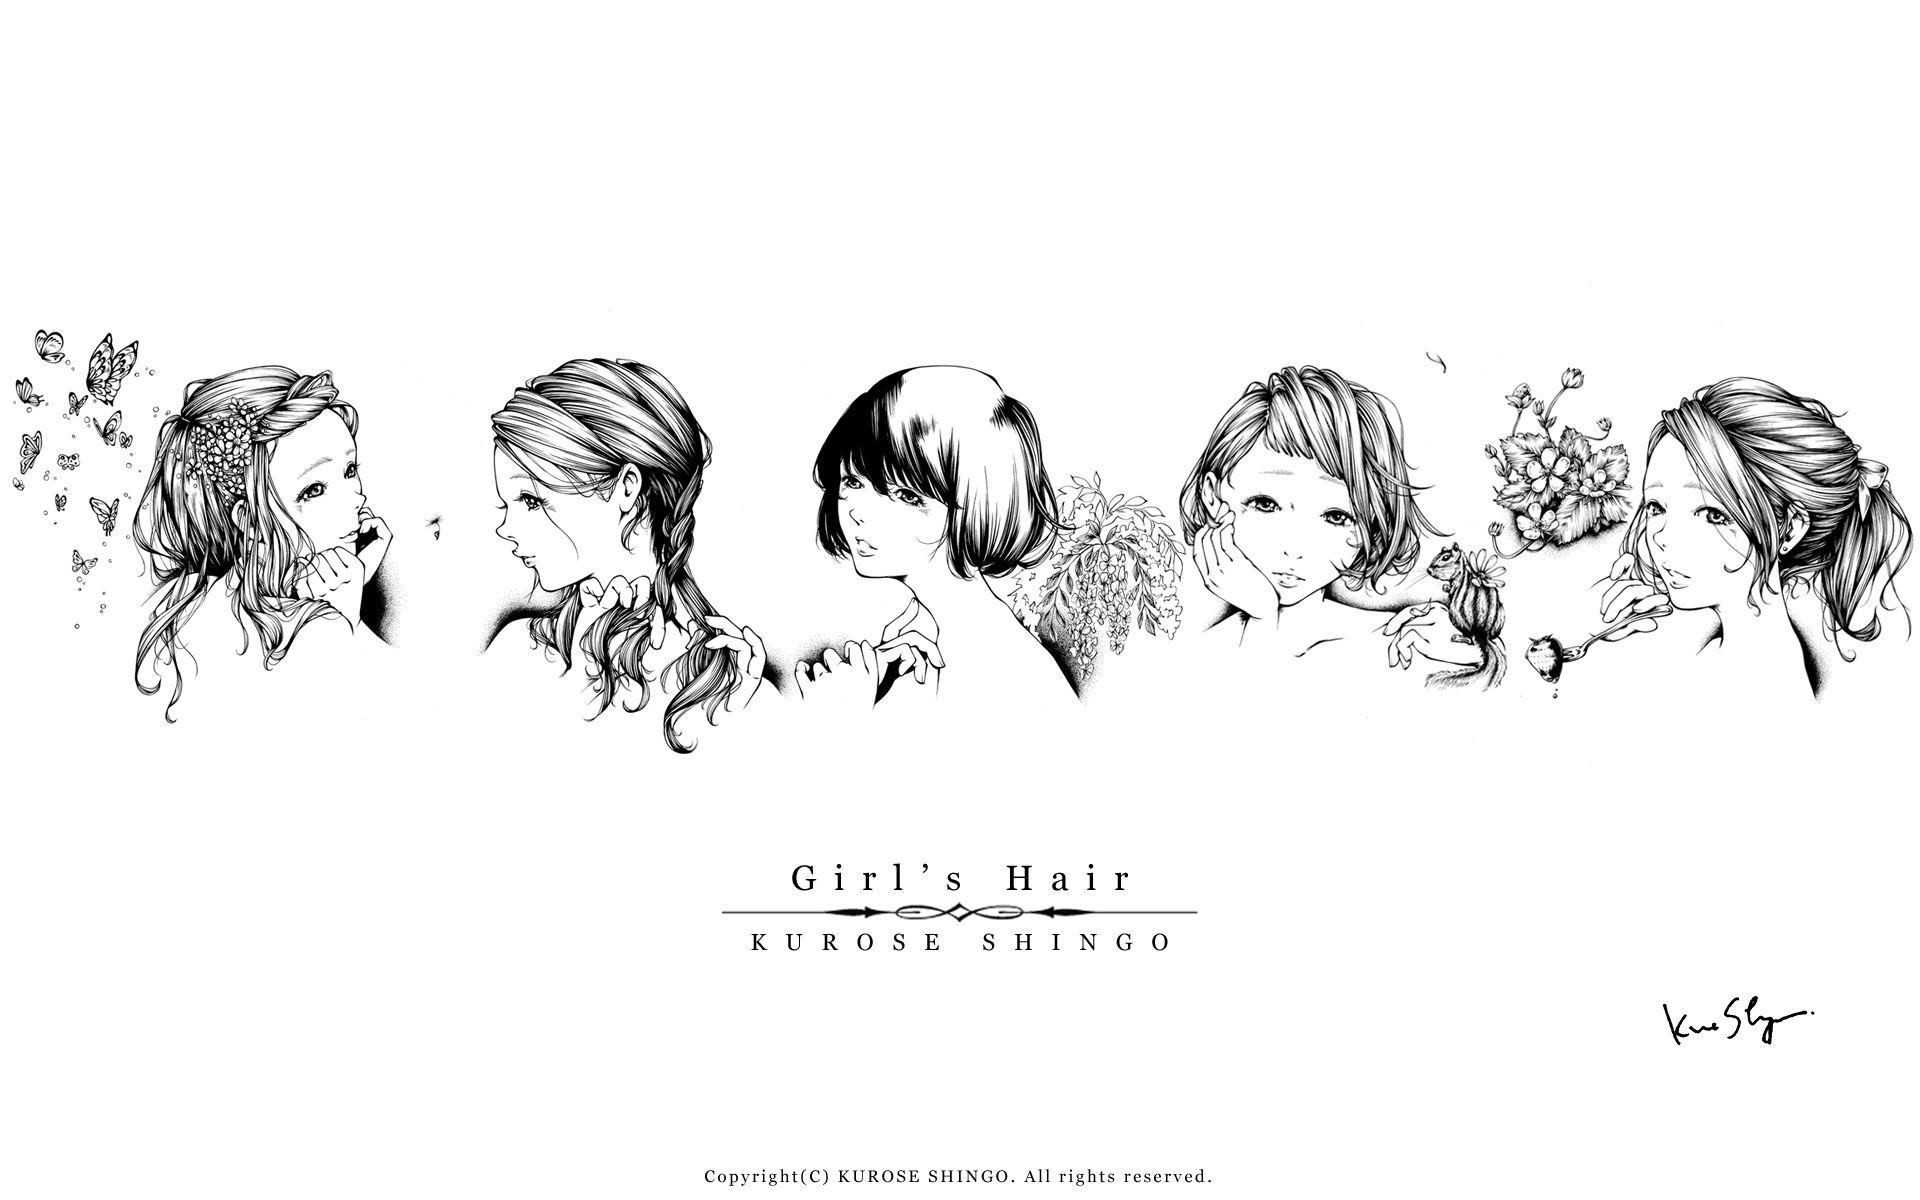 Pc壁紙19 10 Girl S Hair クロセシンゴ Awrd アワード